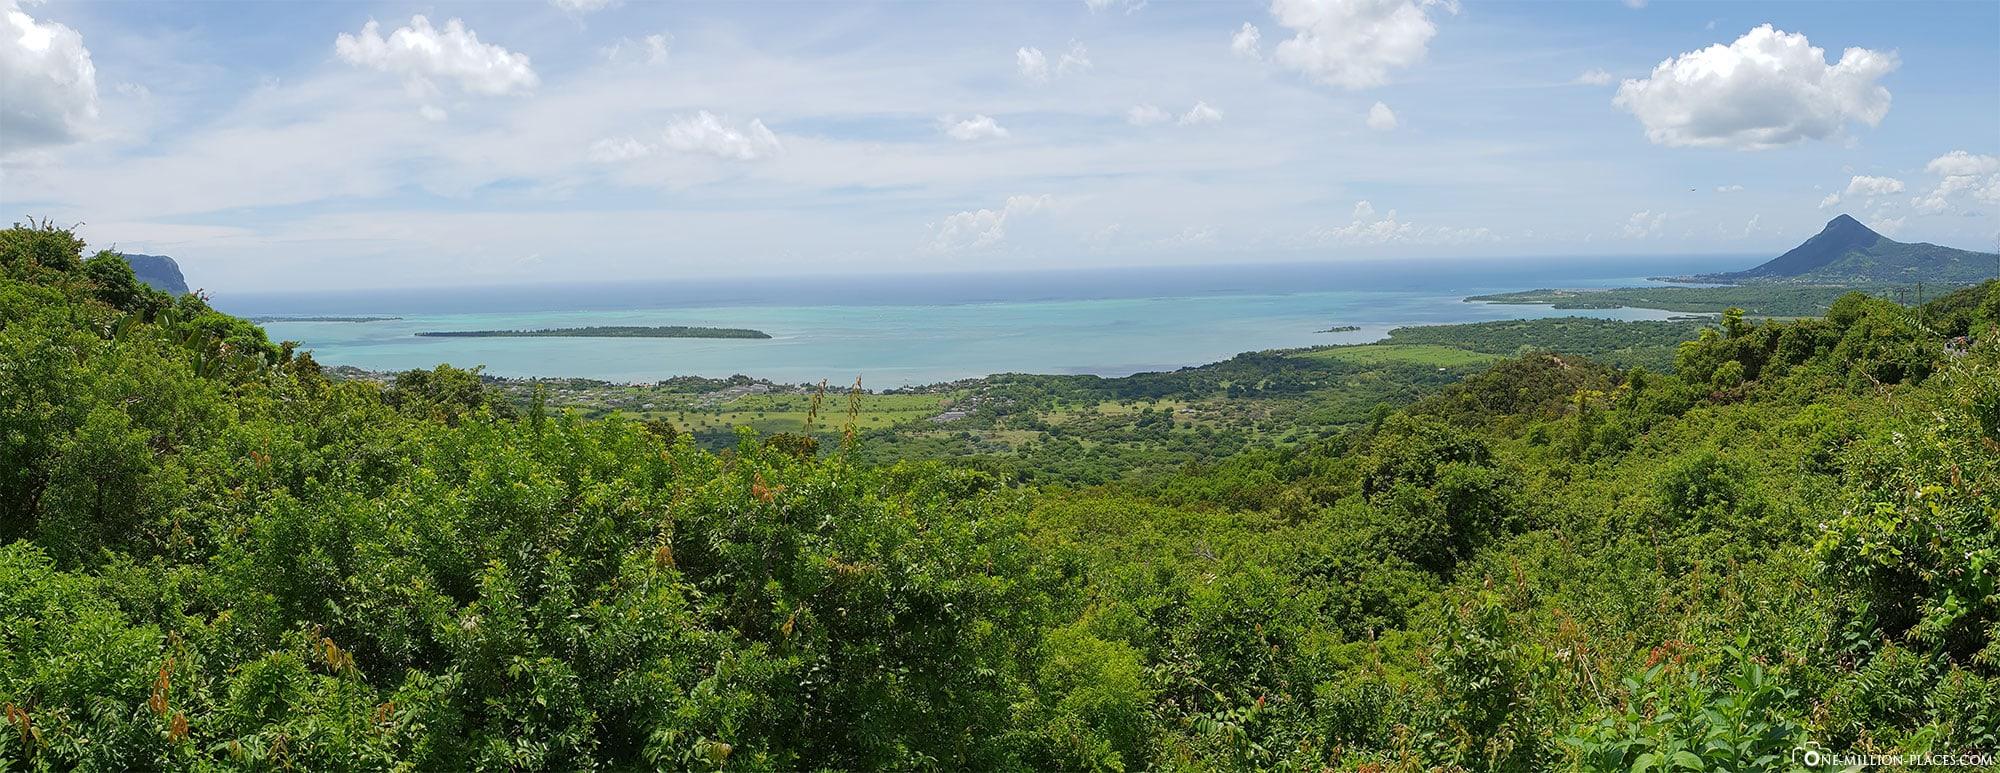 Chamarel Viewpoint, Panoramabild, Mauritius, Reisebericht